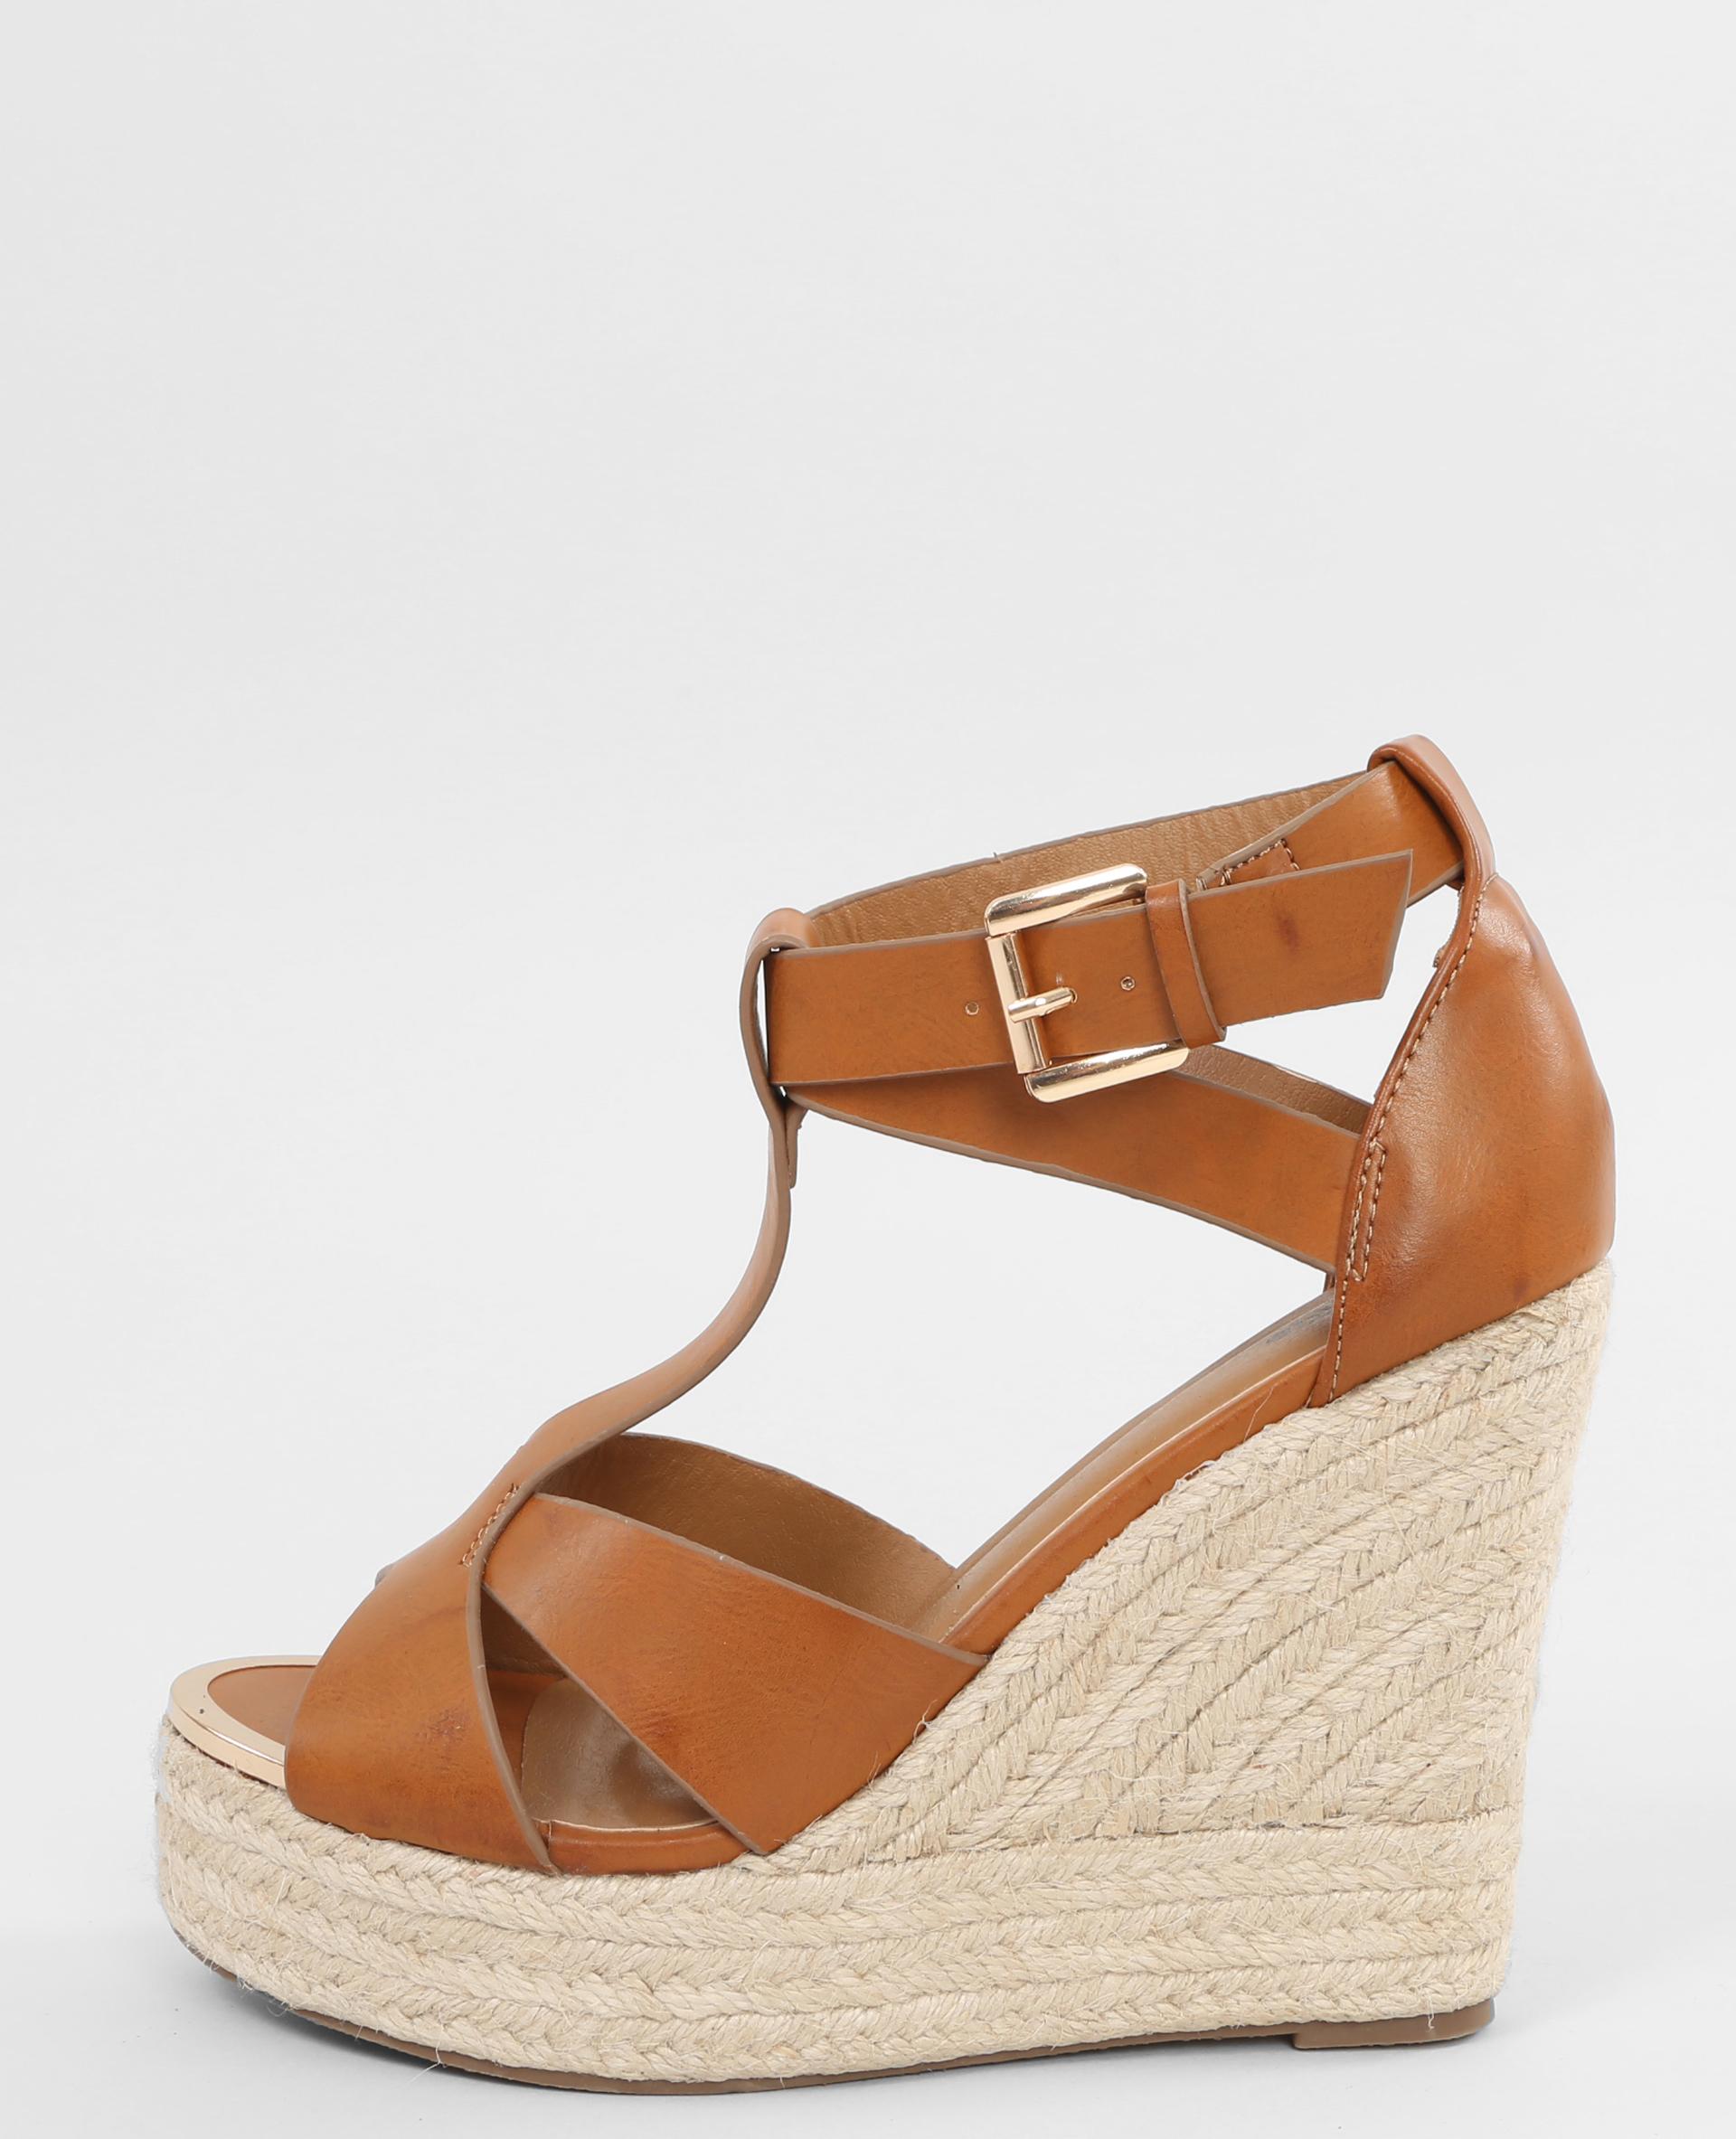 sandales compens es marron 988063747a07 pimkie. Black Bedroom Furniture Sets. Home Design Ideas